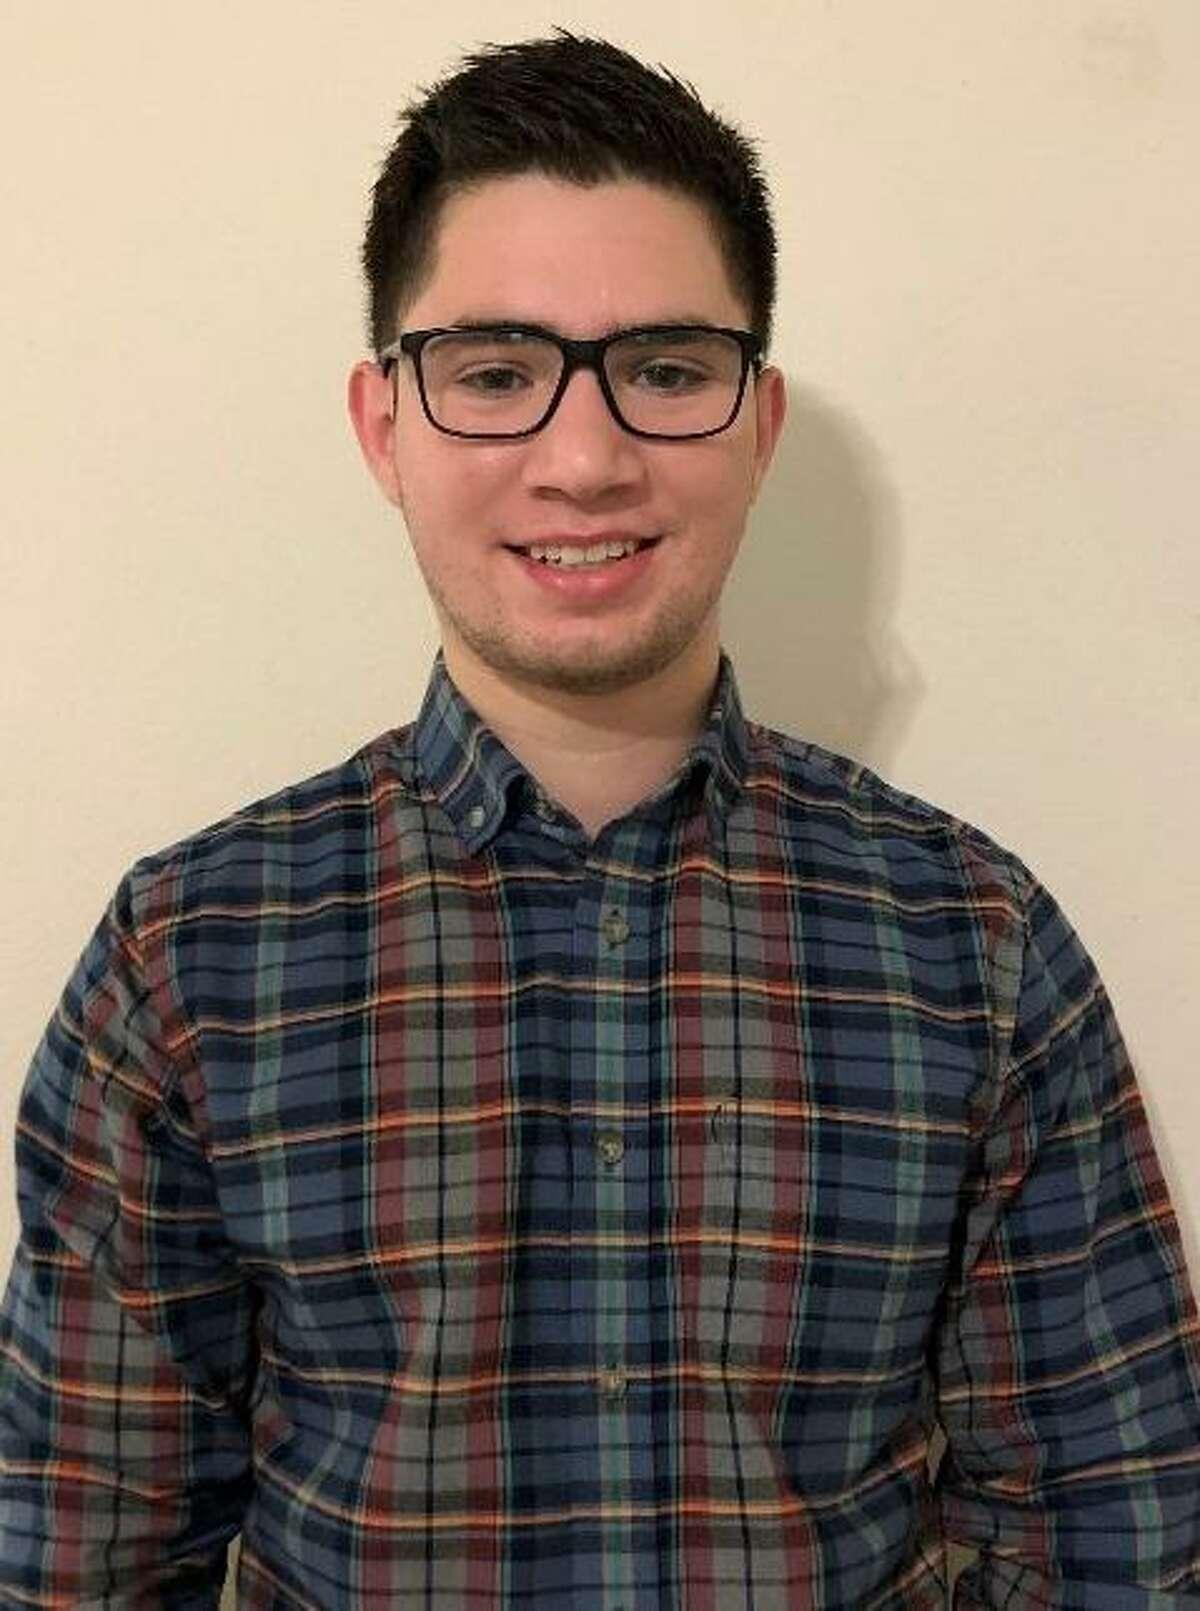 Antonio Gonzalez is a new fourth grade math teacher at Tamarron Elementary in Katy.